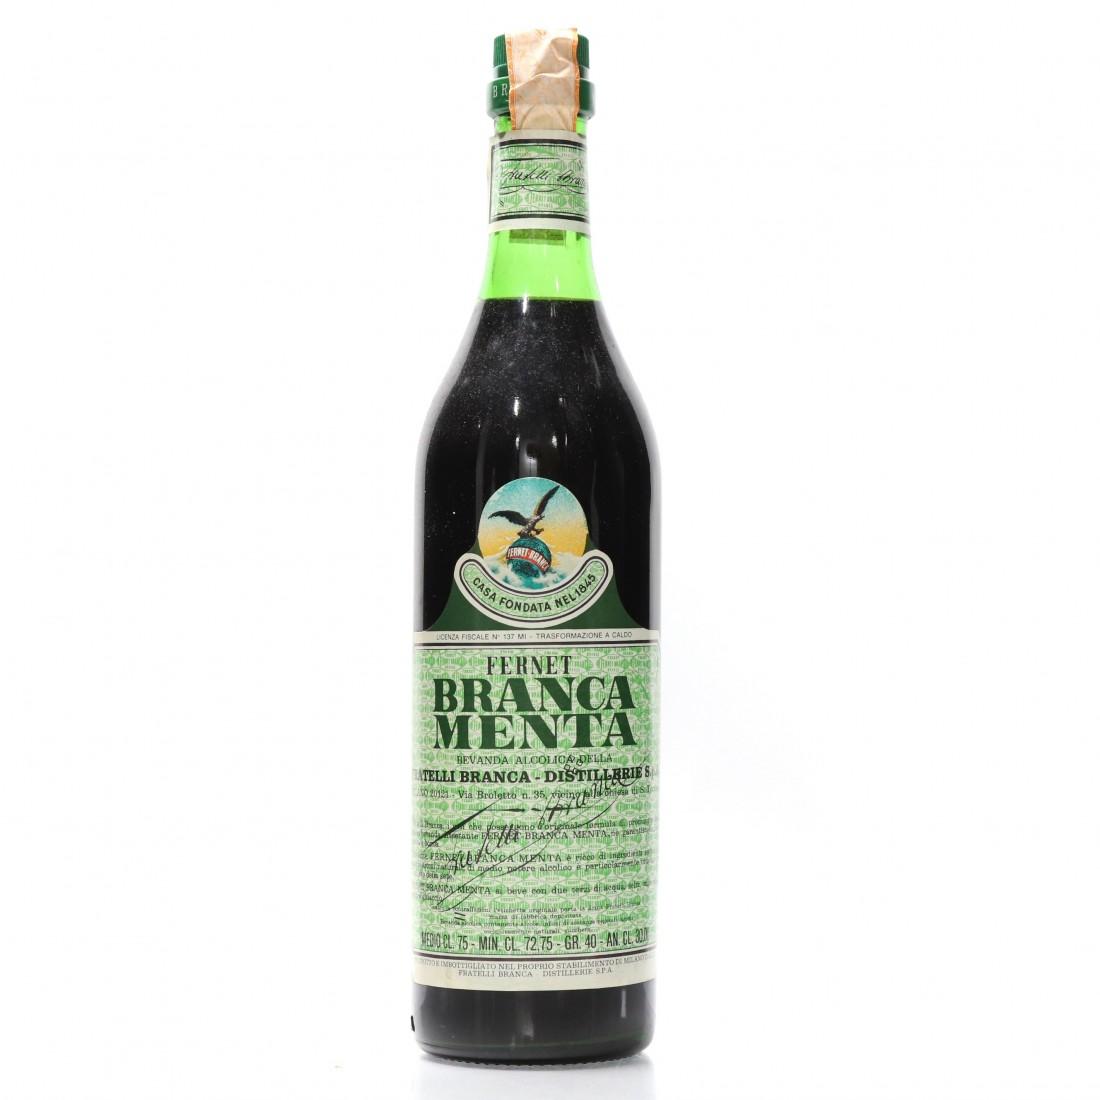 Fernet-Branca Menta 1970s